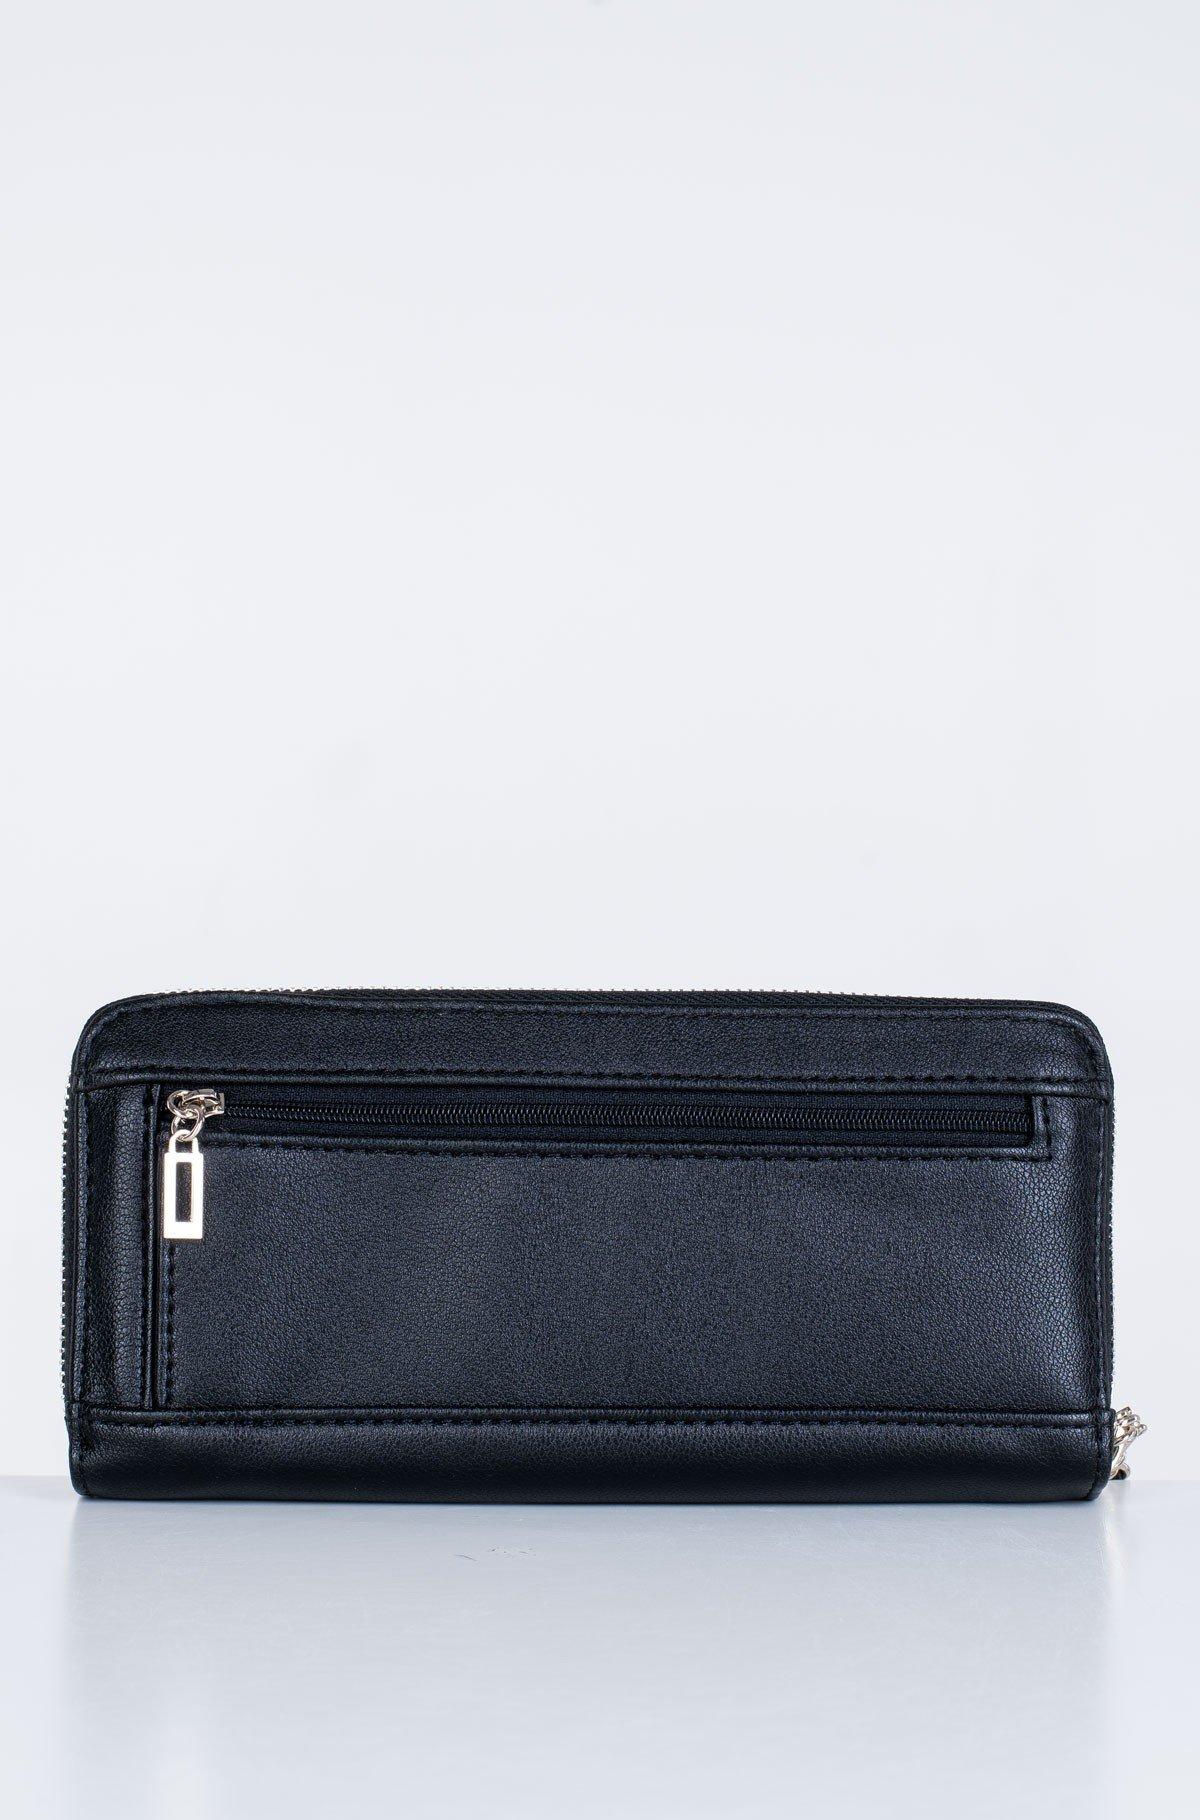 Wallet SWVG74 80460-full-3